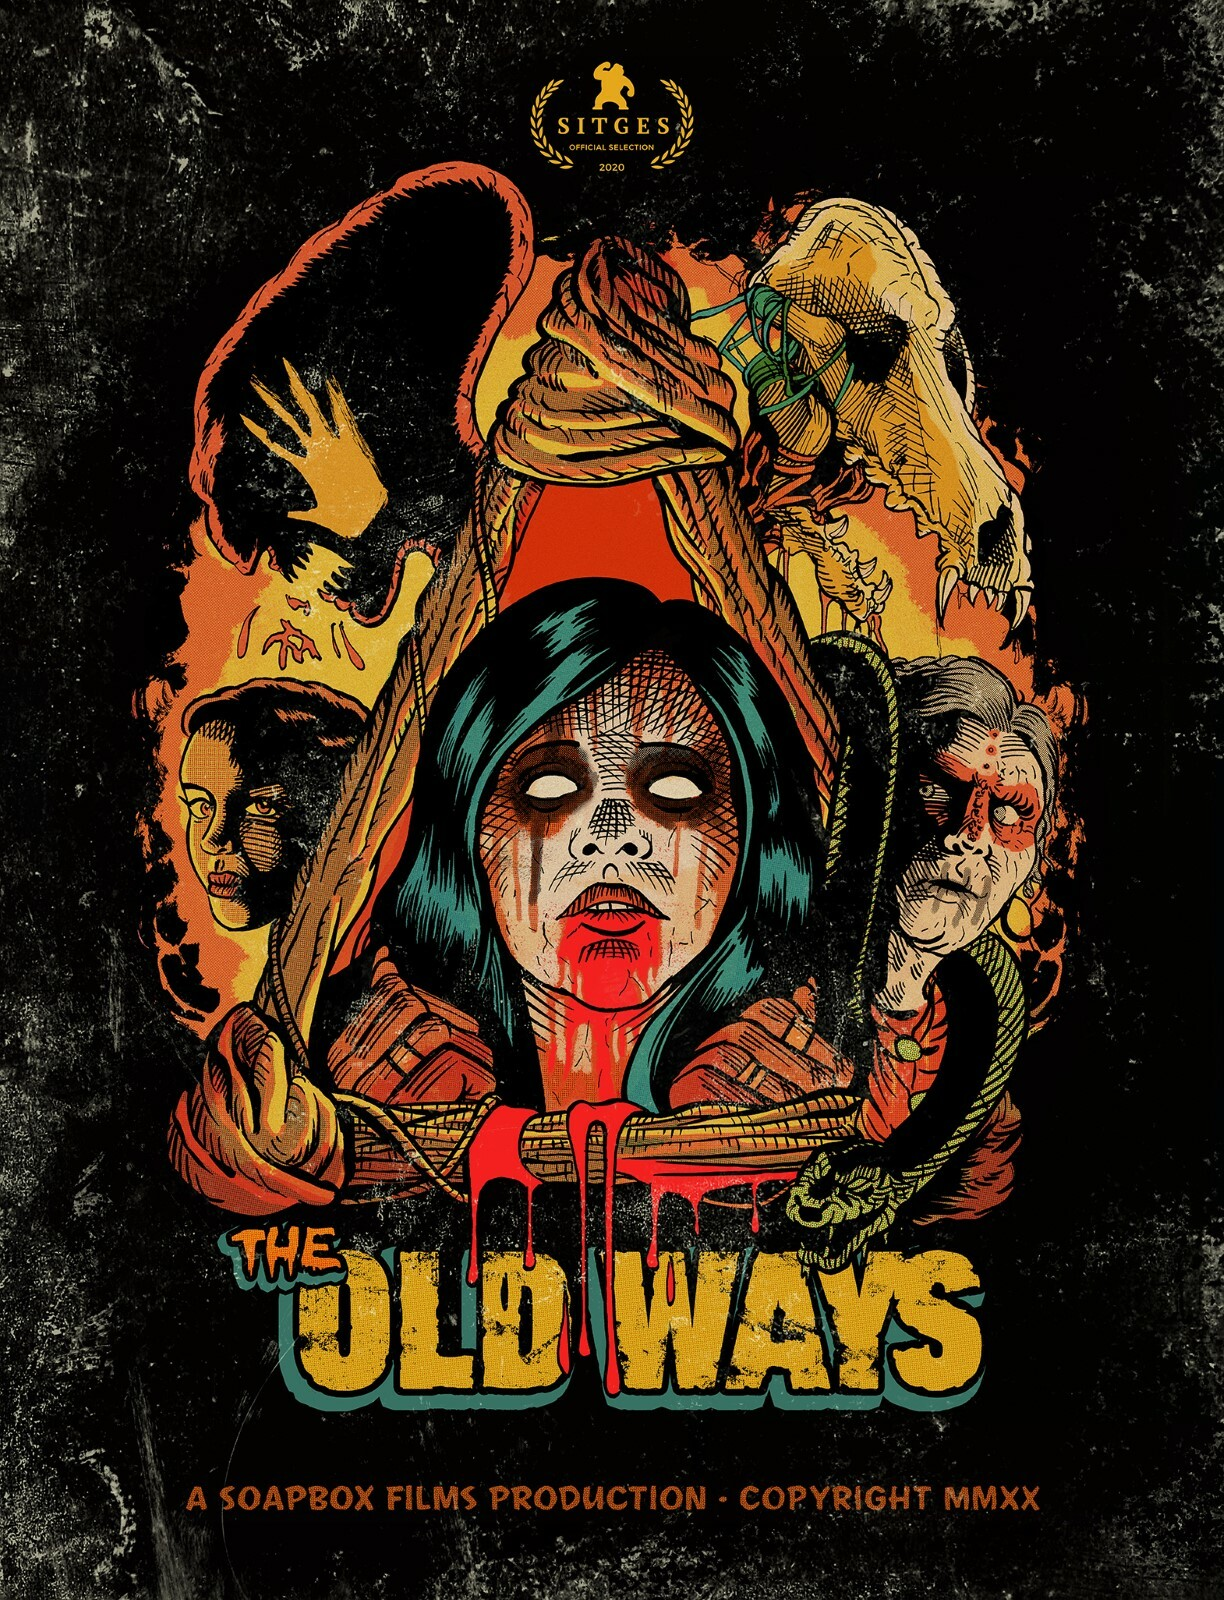 Eski Ayinler - The Old Ways (2020) 1080p NF WEB-DL DDP5.1 Atmos H.264 DUAL [TR EN]